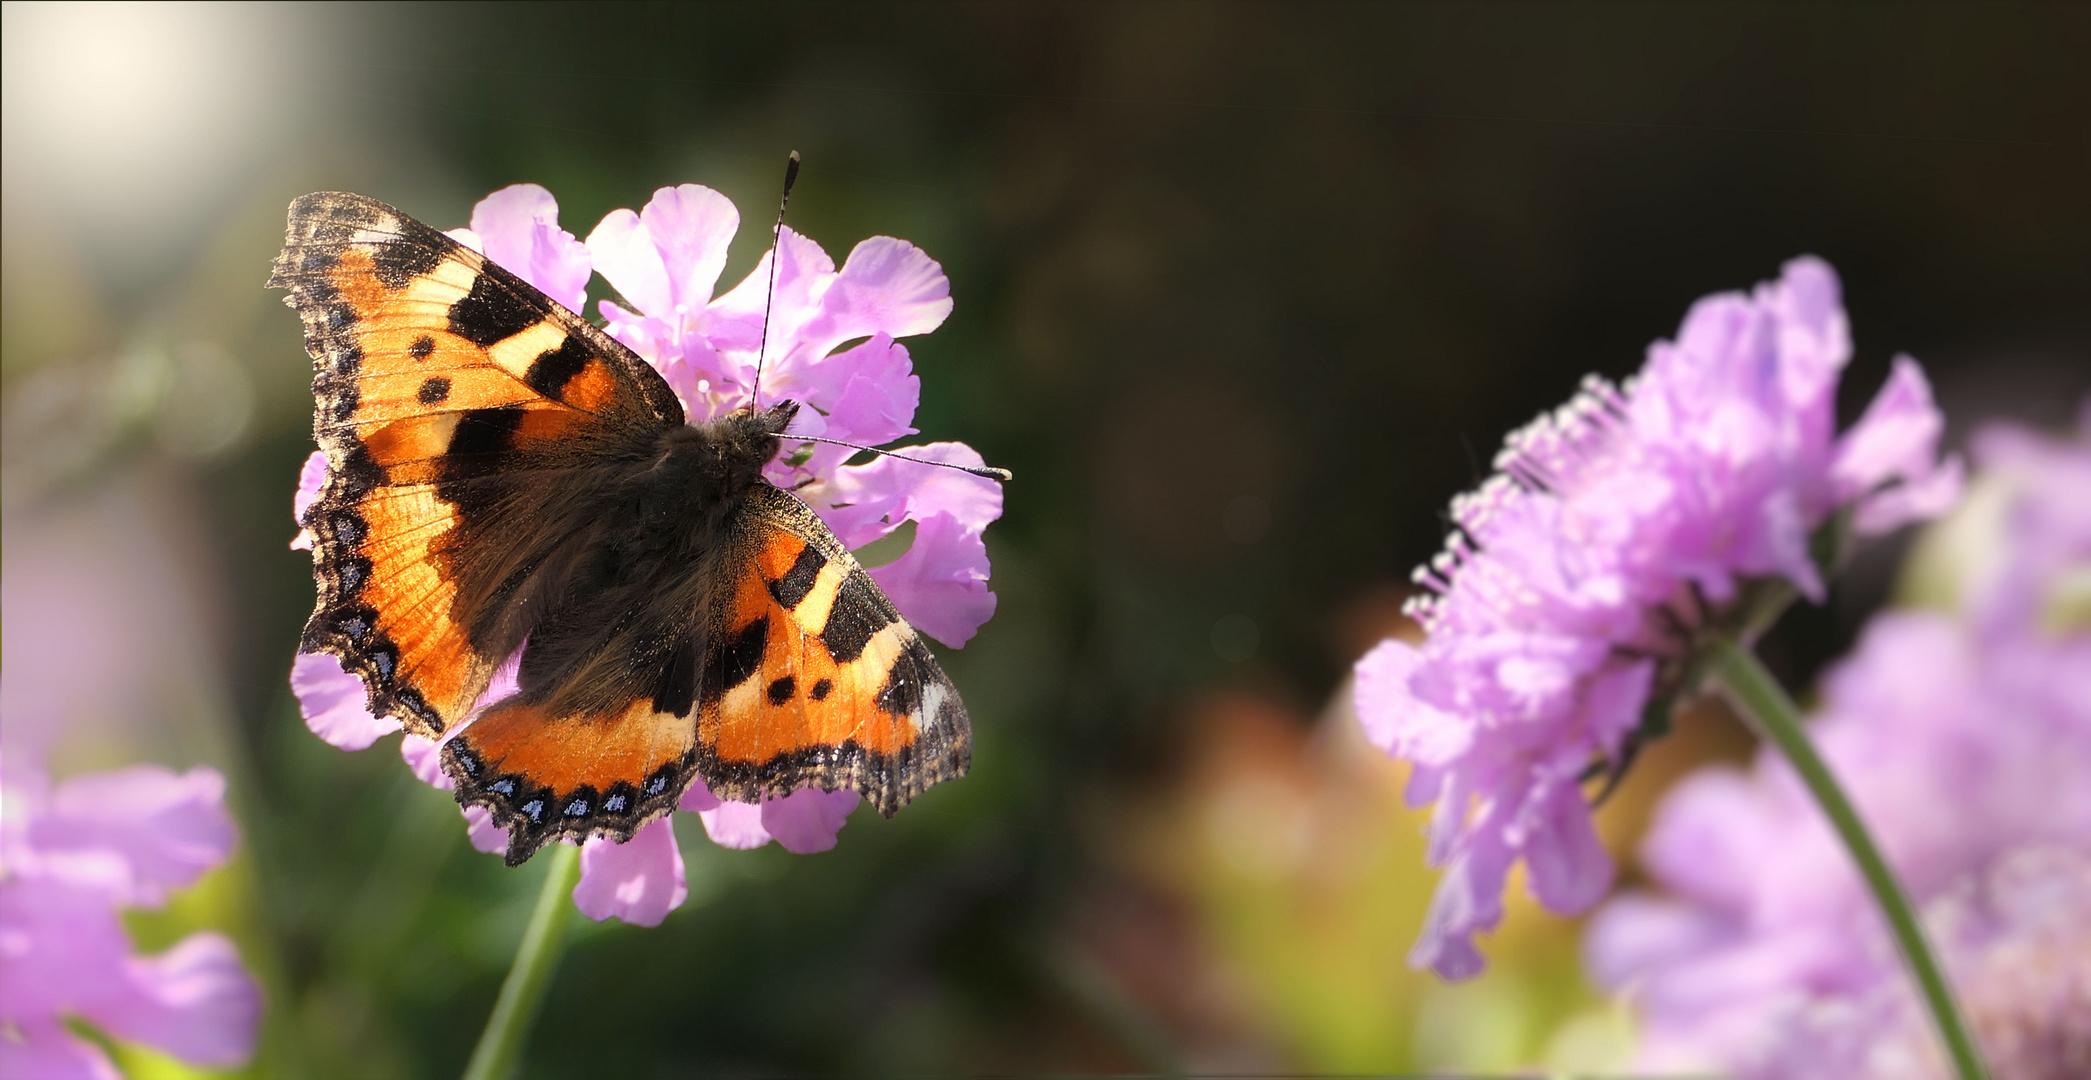 ... careless butterfly on a pink flower